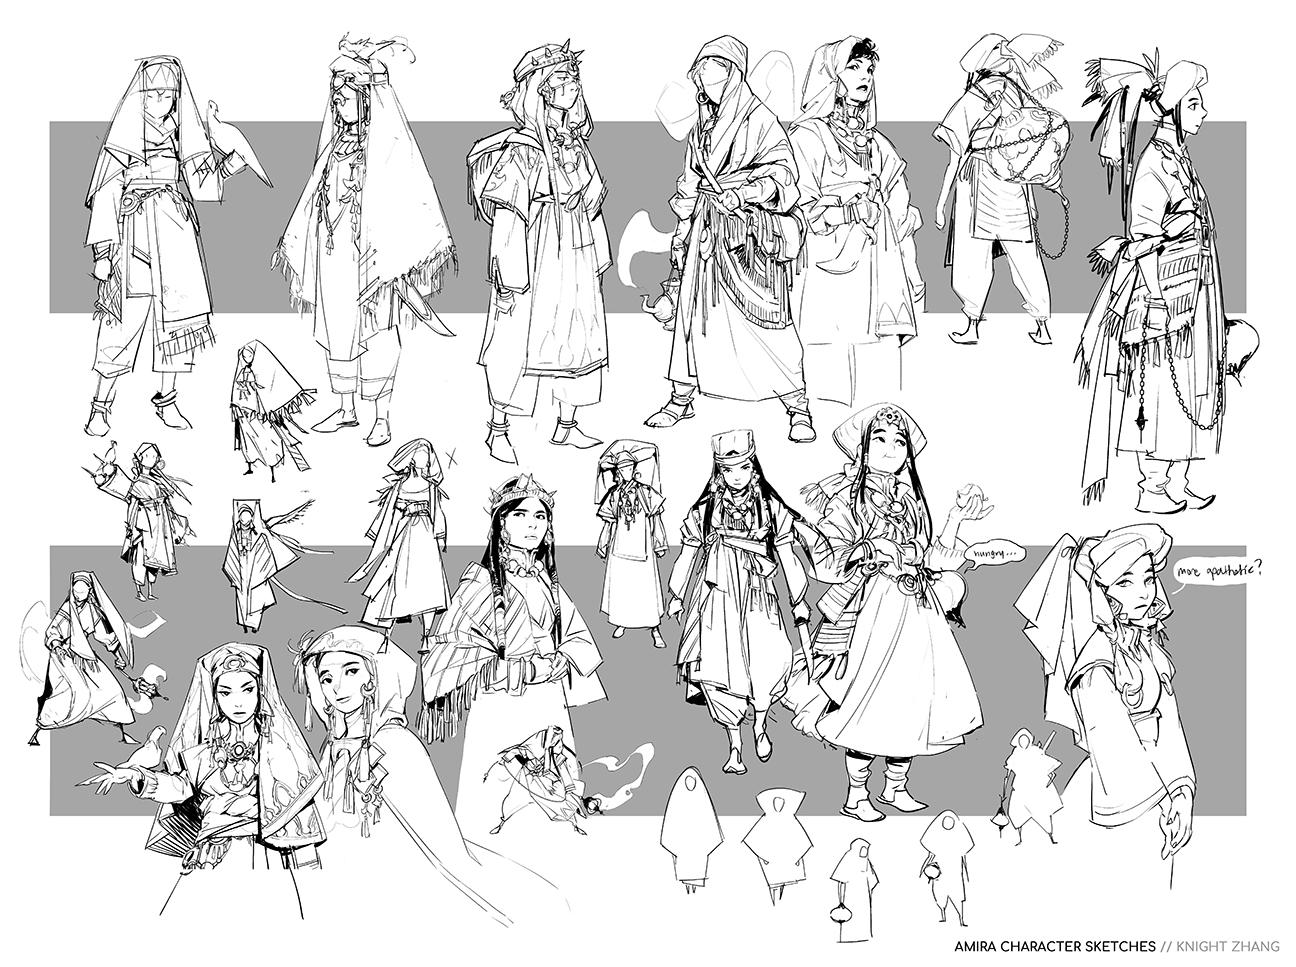 GirlsclubAsia-ConceptArtist-Illustrator- Knight Zhang-KnightZ_Amira Sketch_01